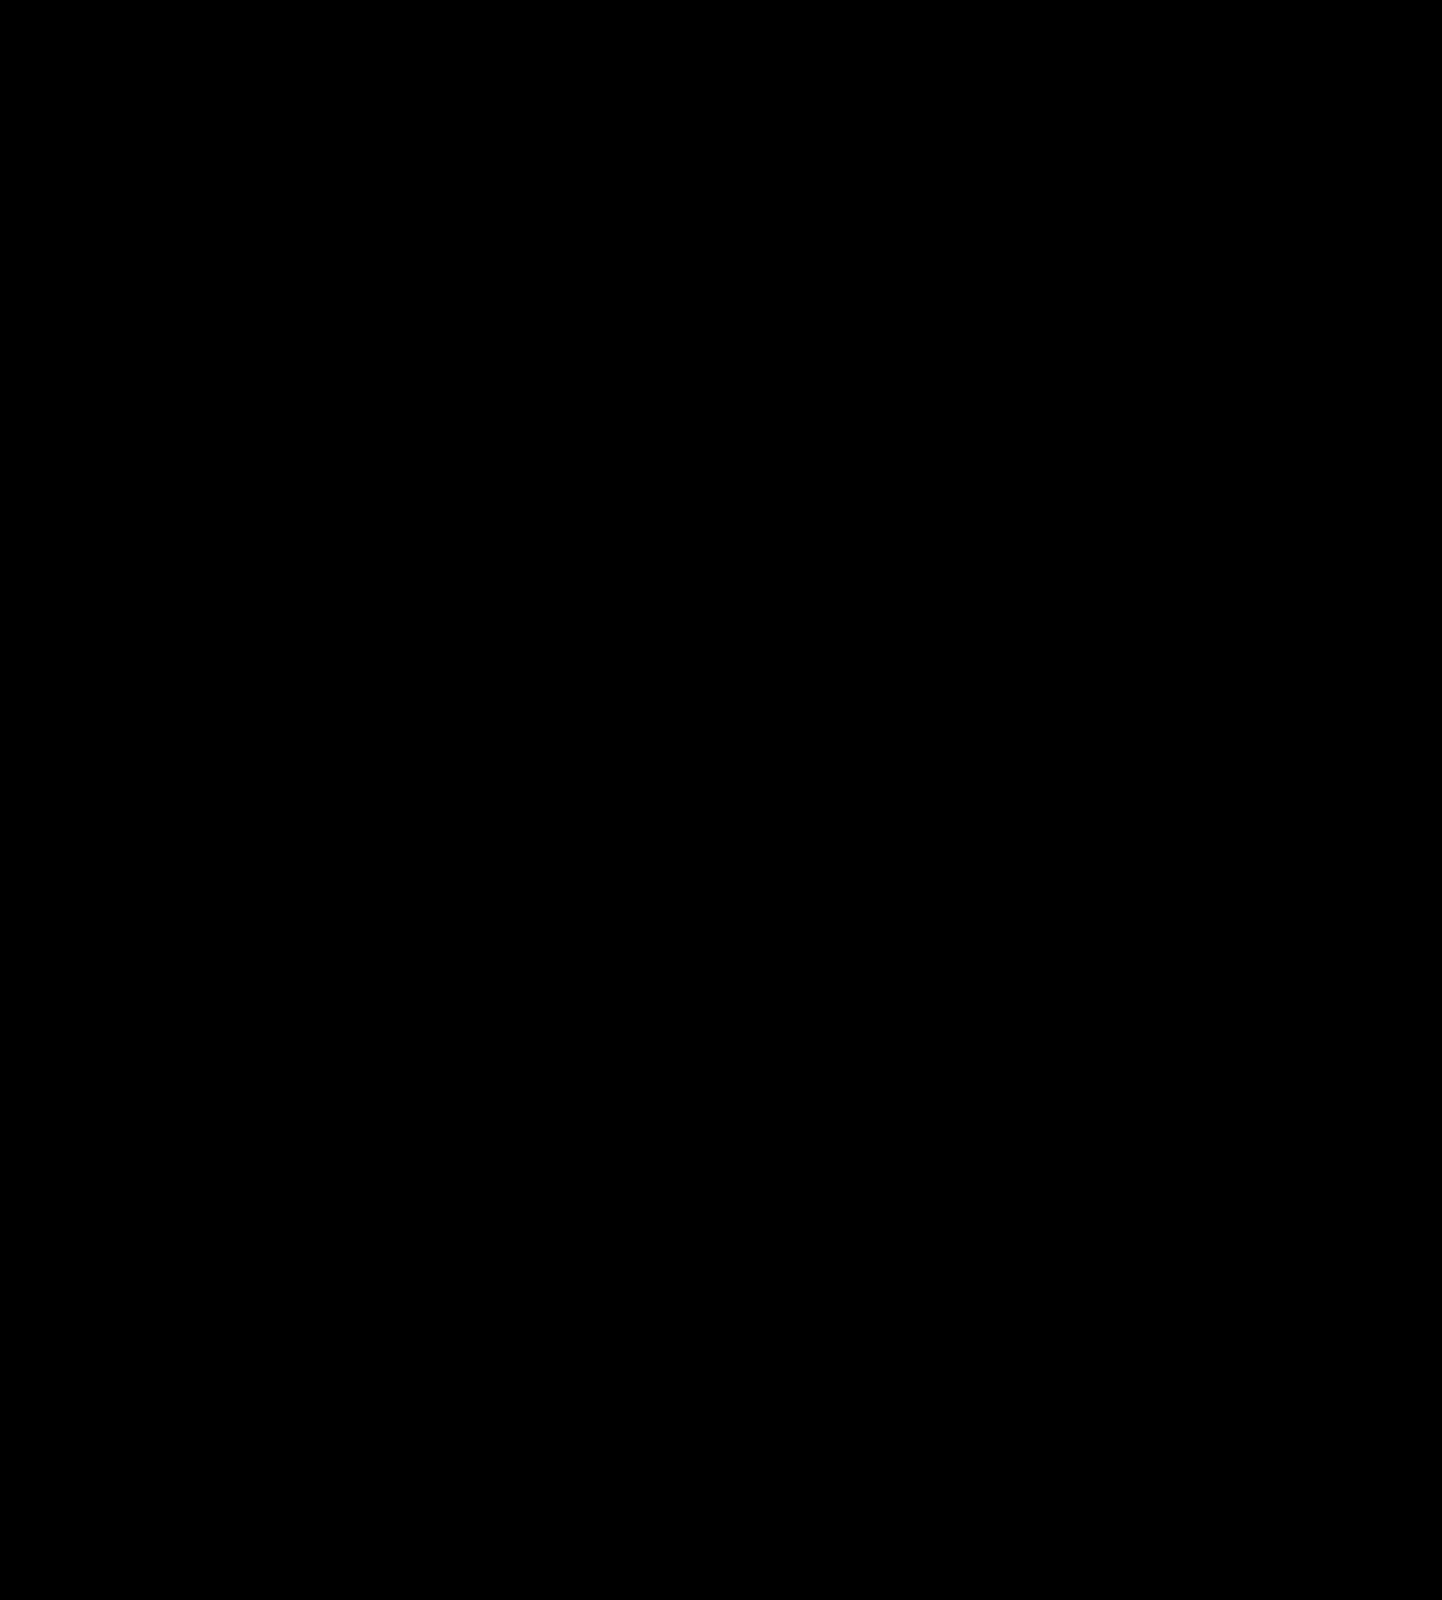 Rivka S Renditions Monogram Key Strokes